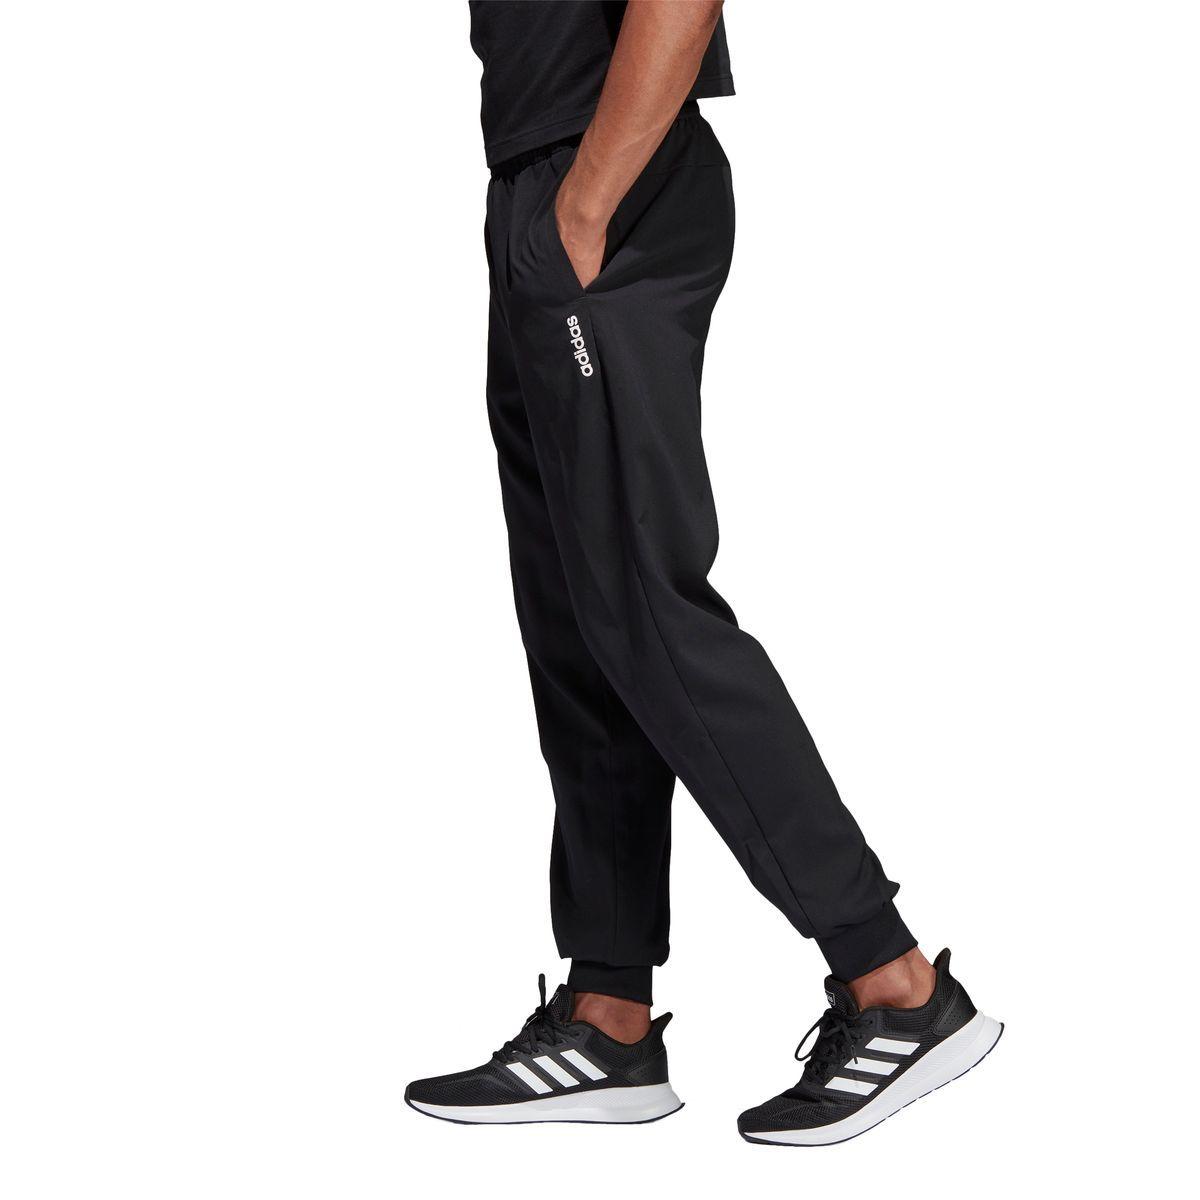 pantalon adidas homme stanford